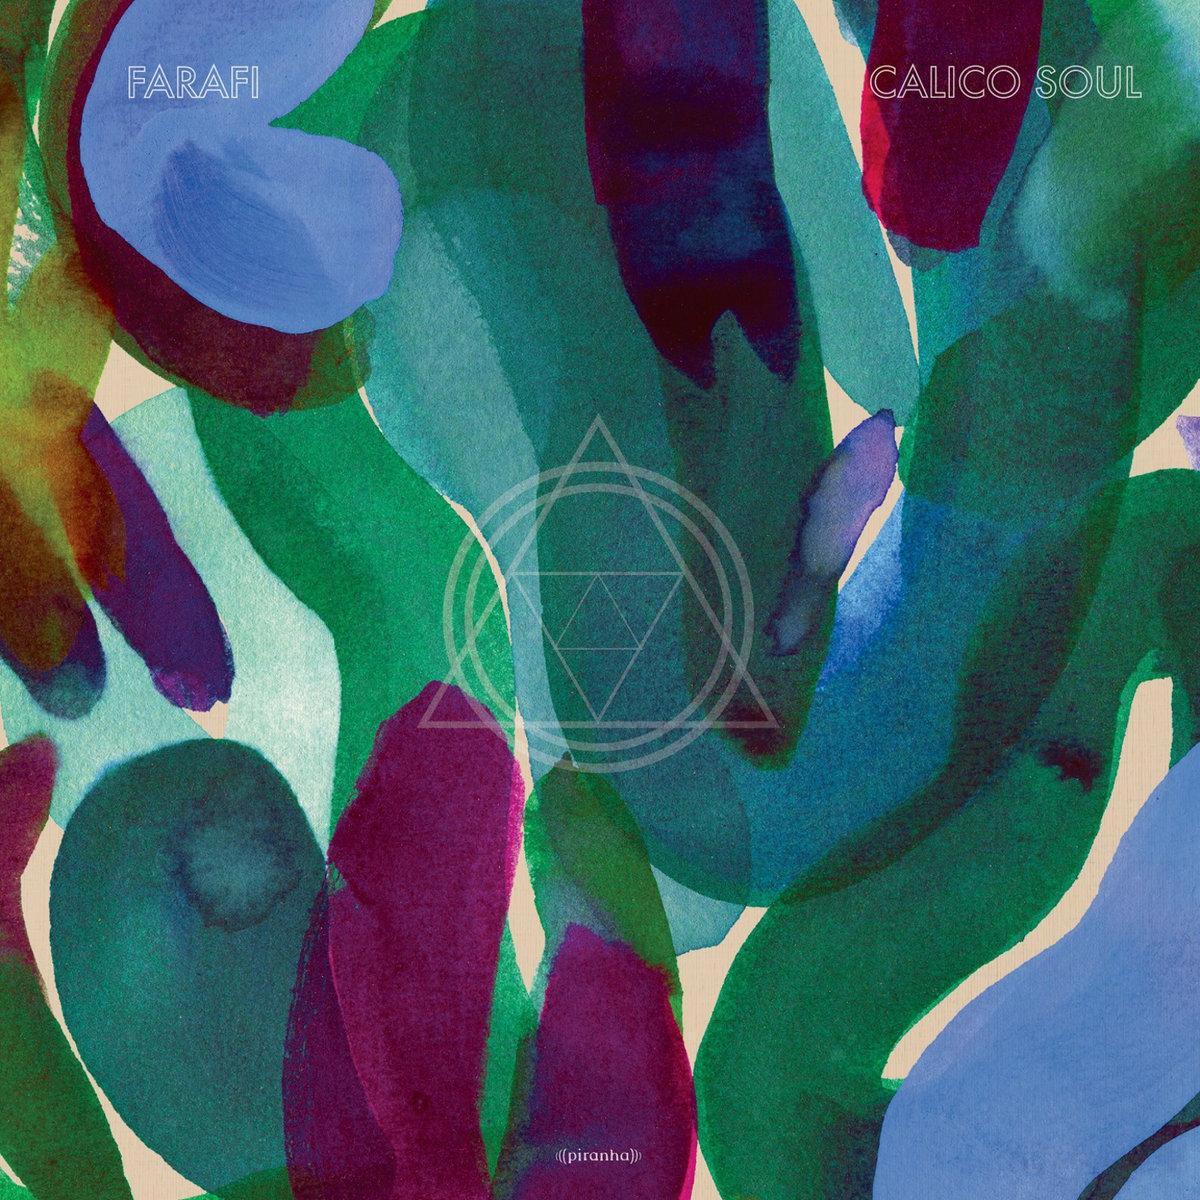 Calico Soul Farafi